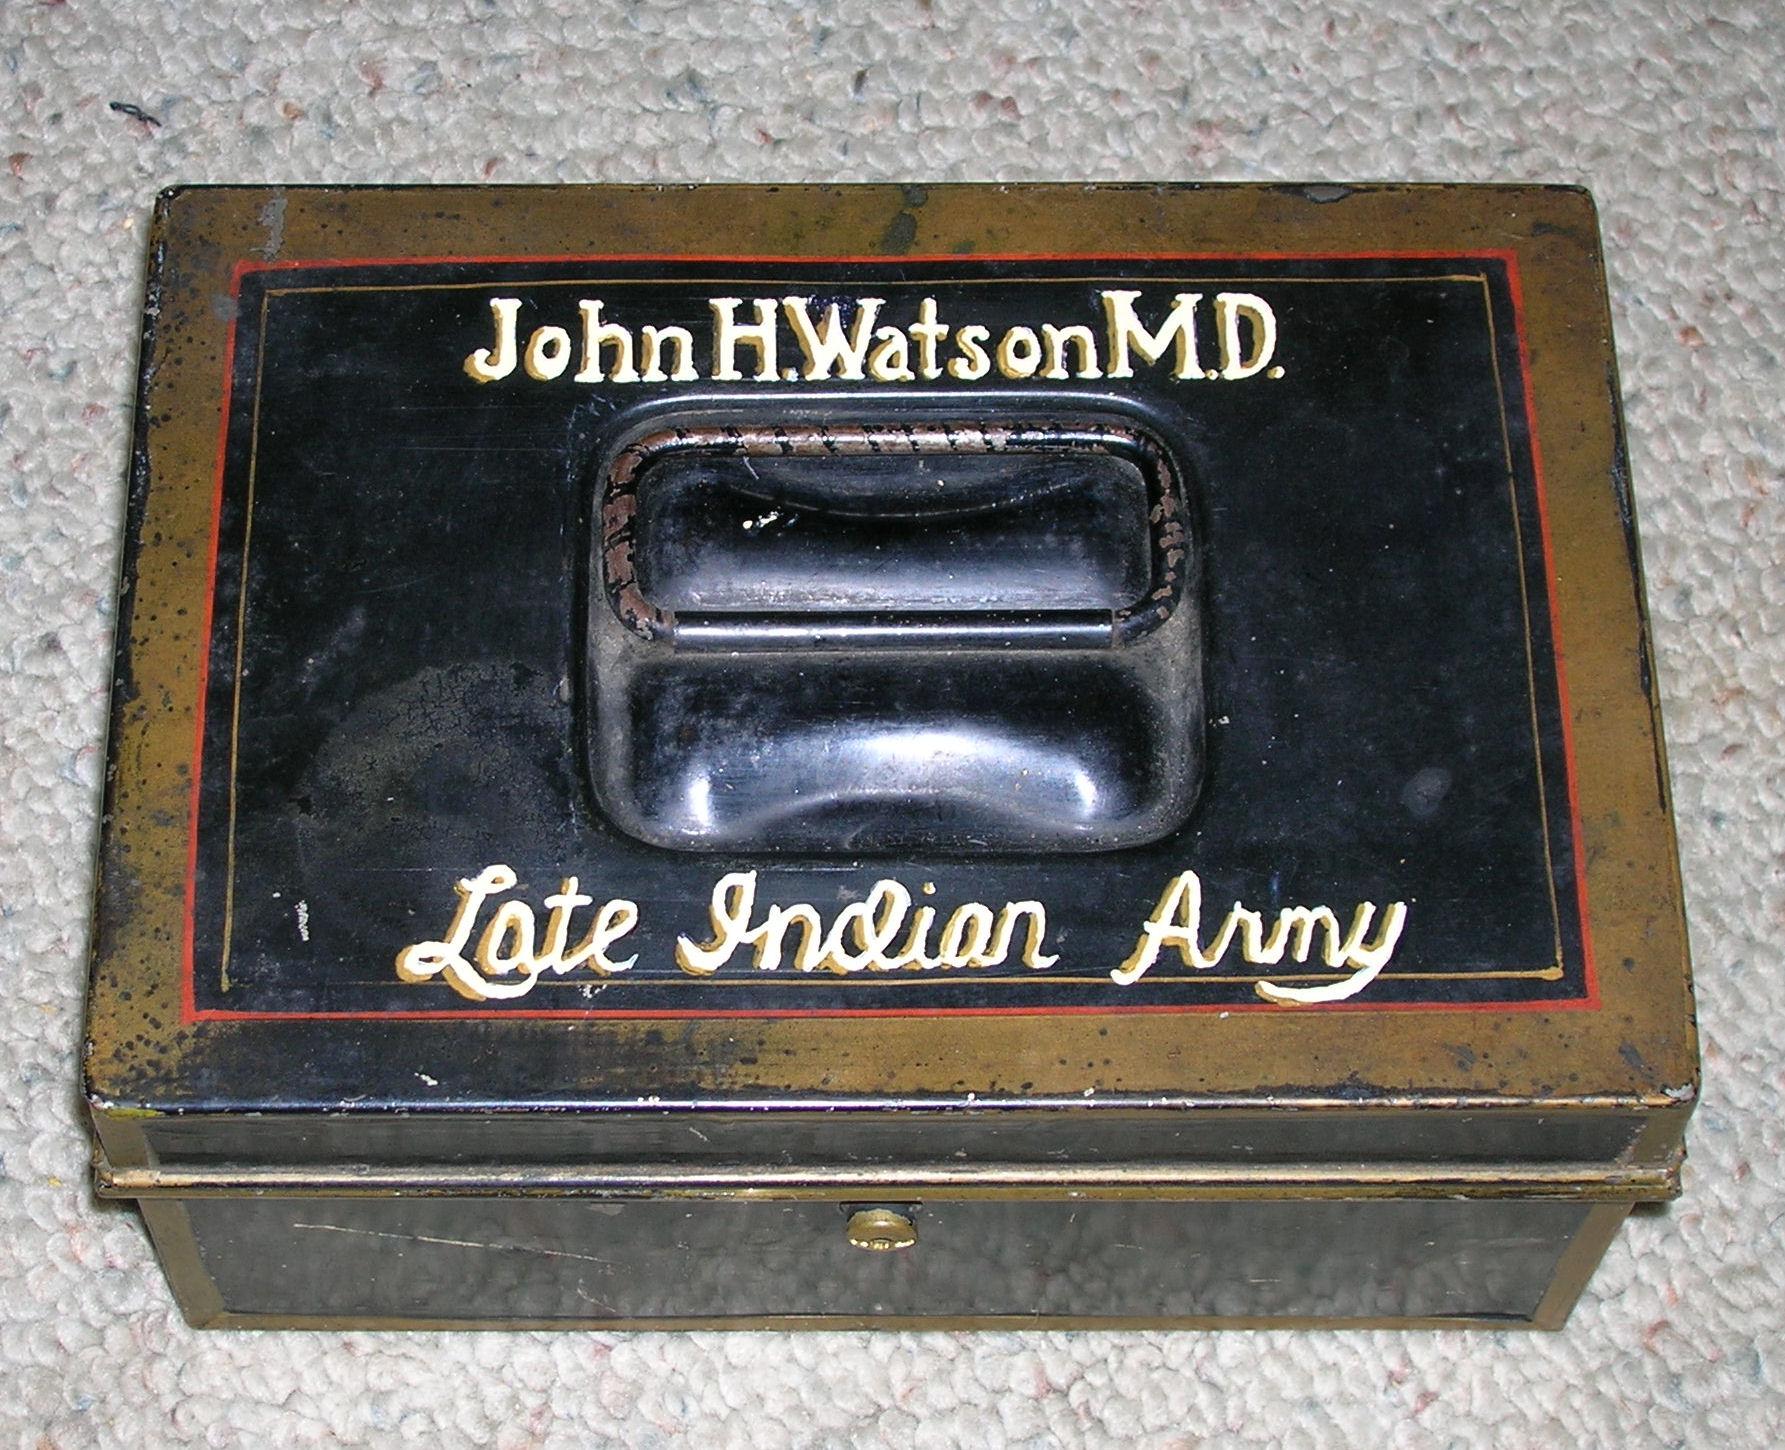 From Watson's Tin Box: The Golden Pince-Nez